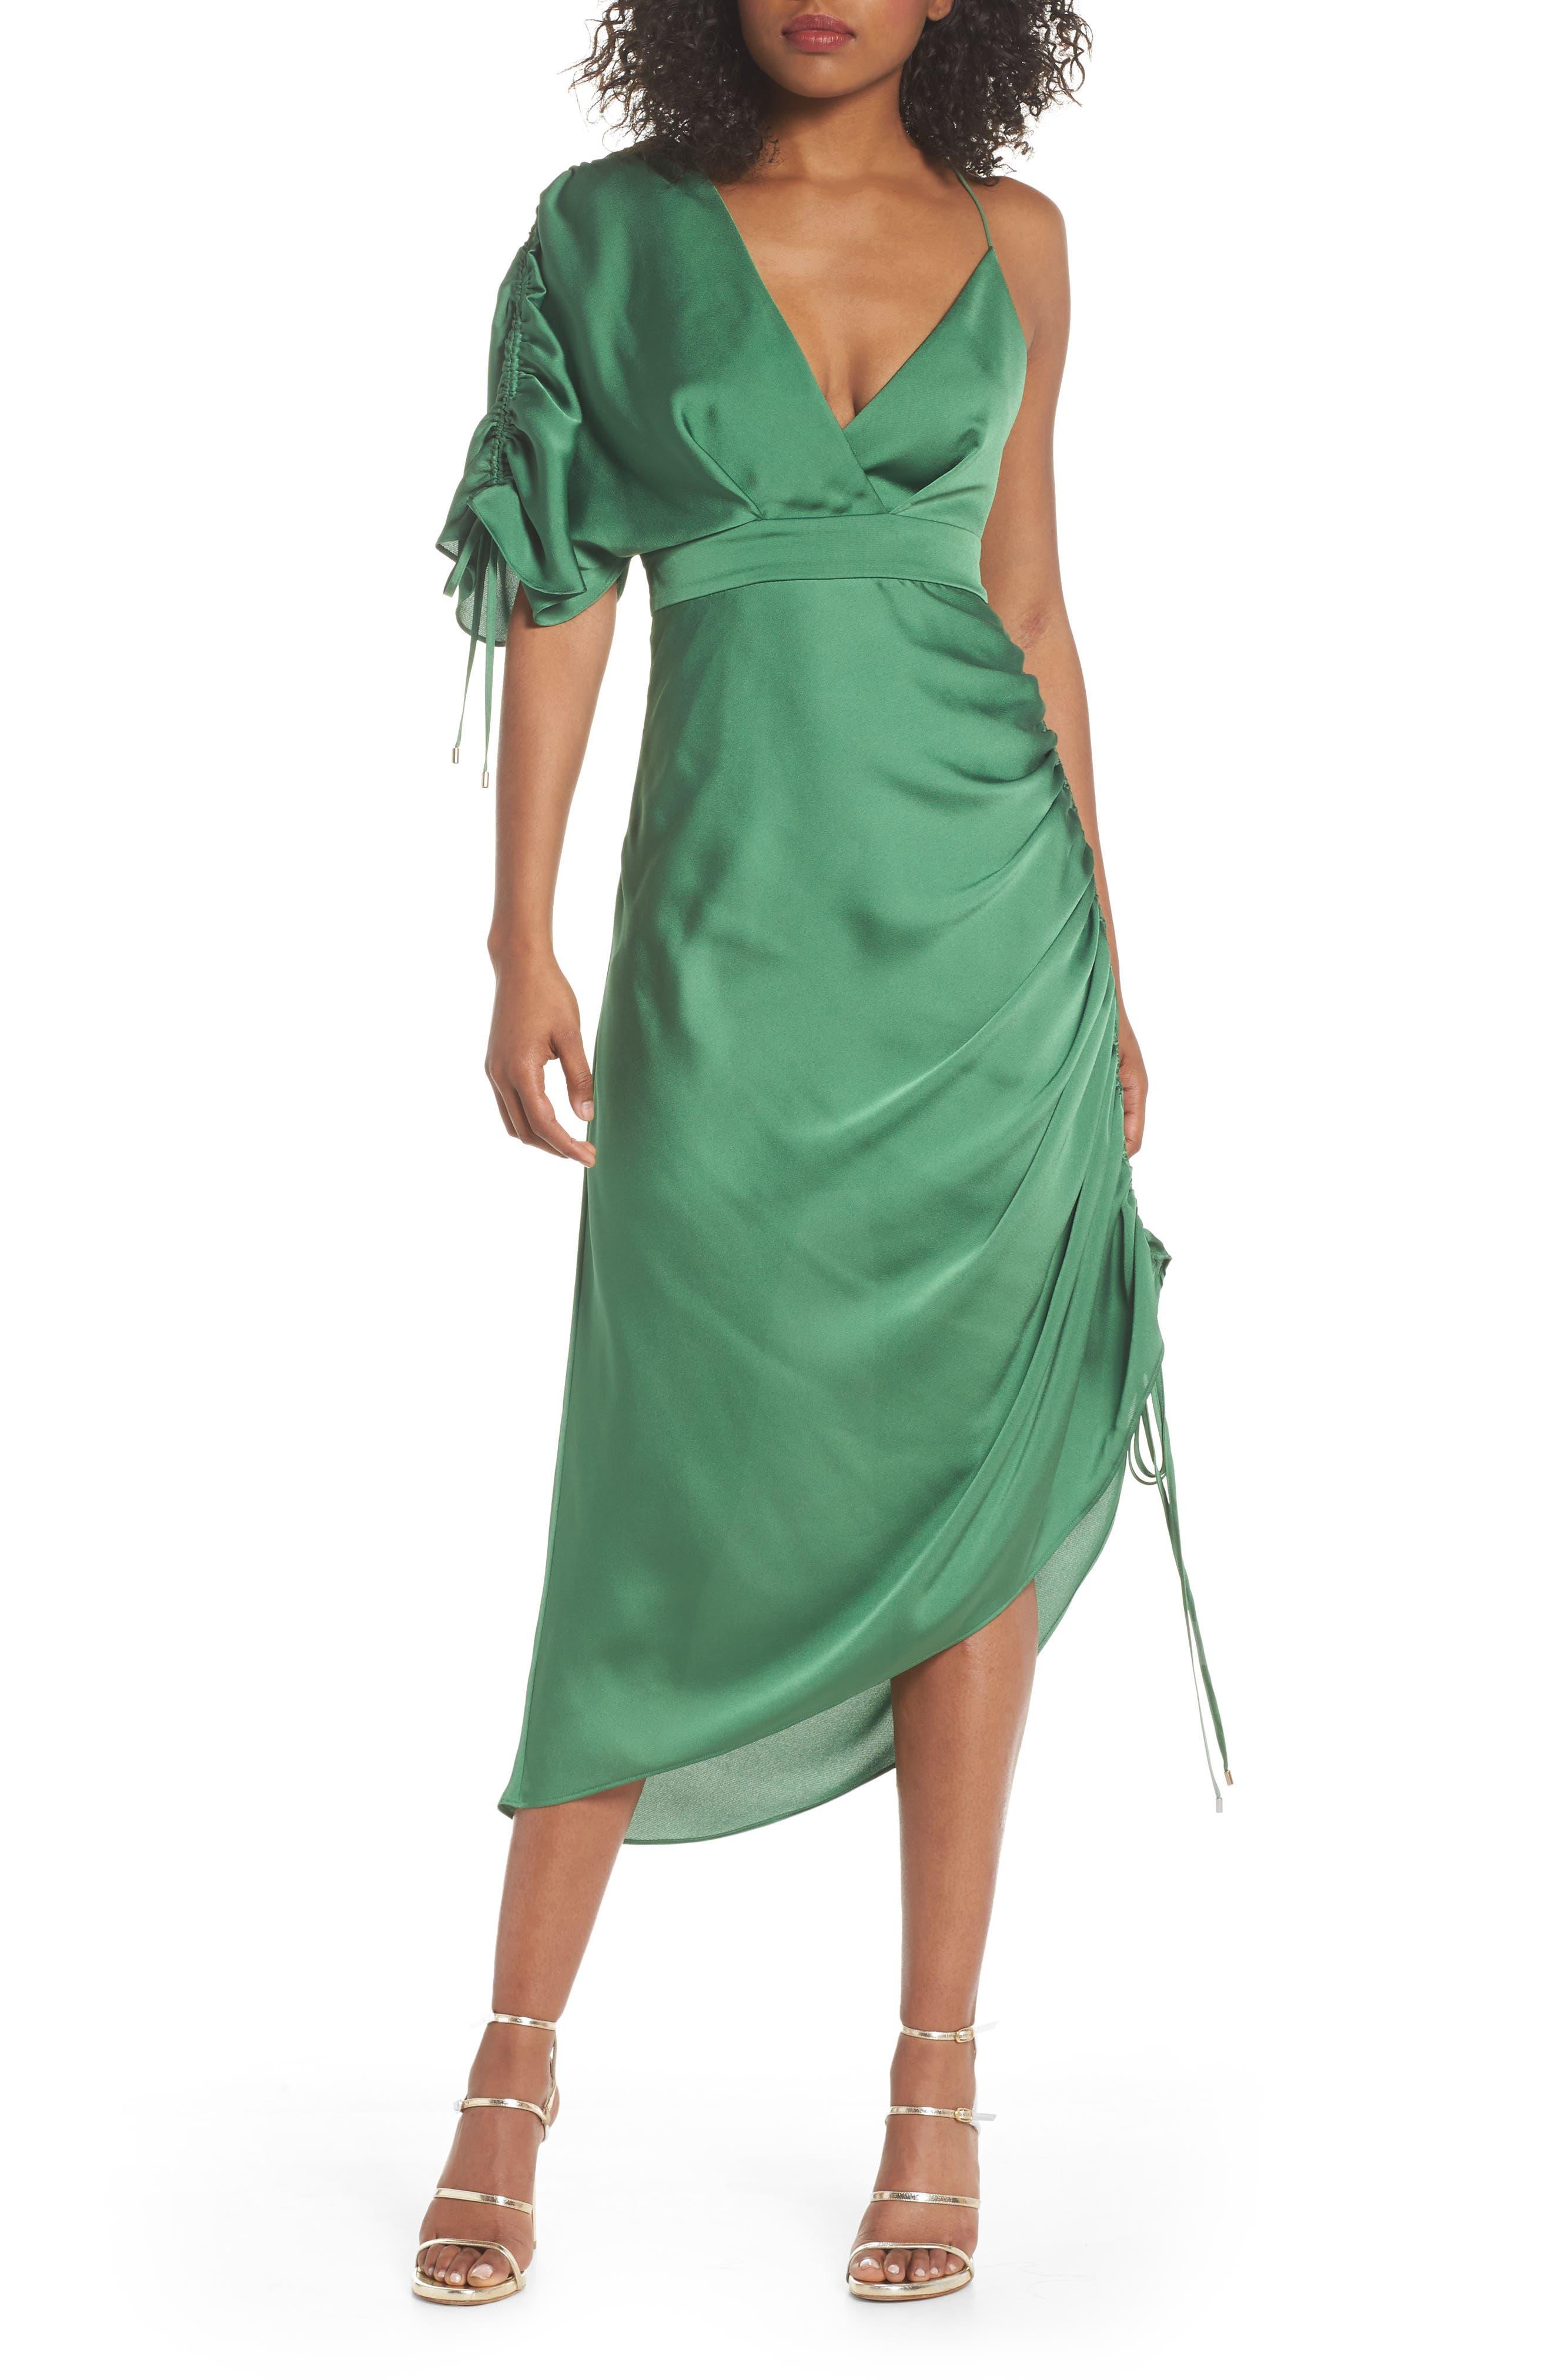 I've Got You Asymmetrical Satin Dress,                             Main thumbnail 1, color,                             Emerald Green